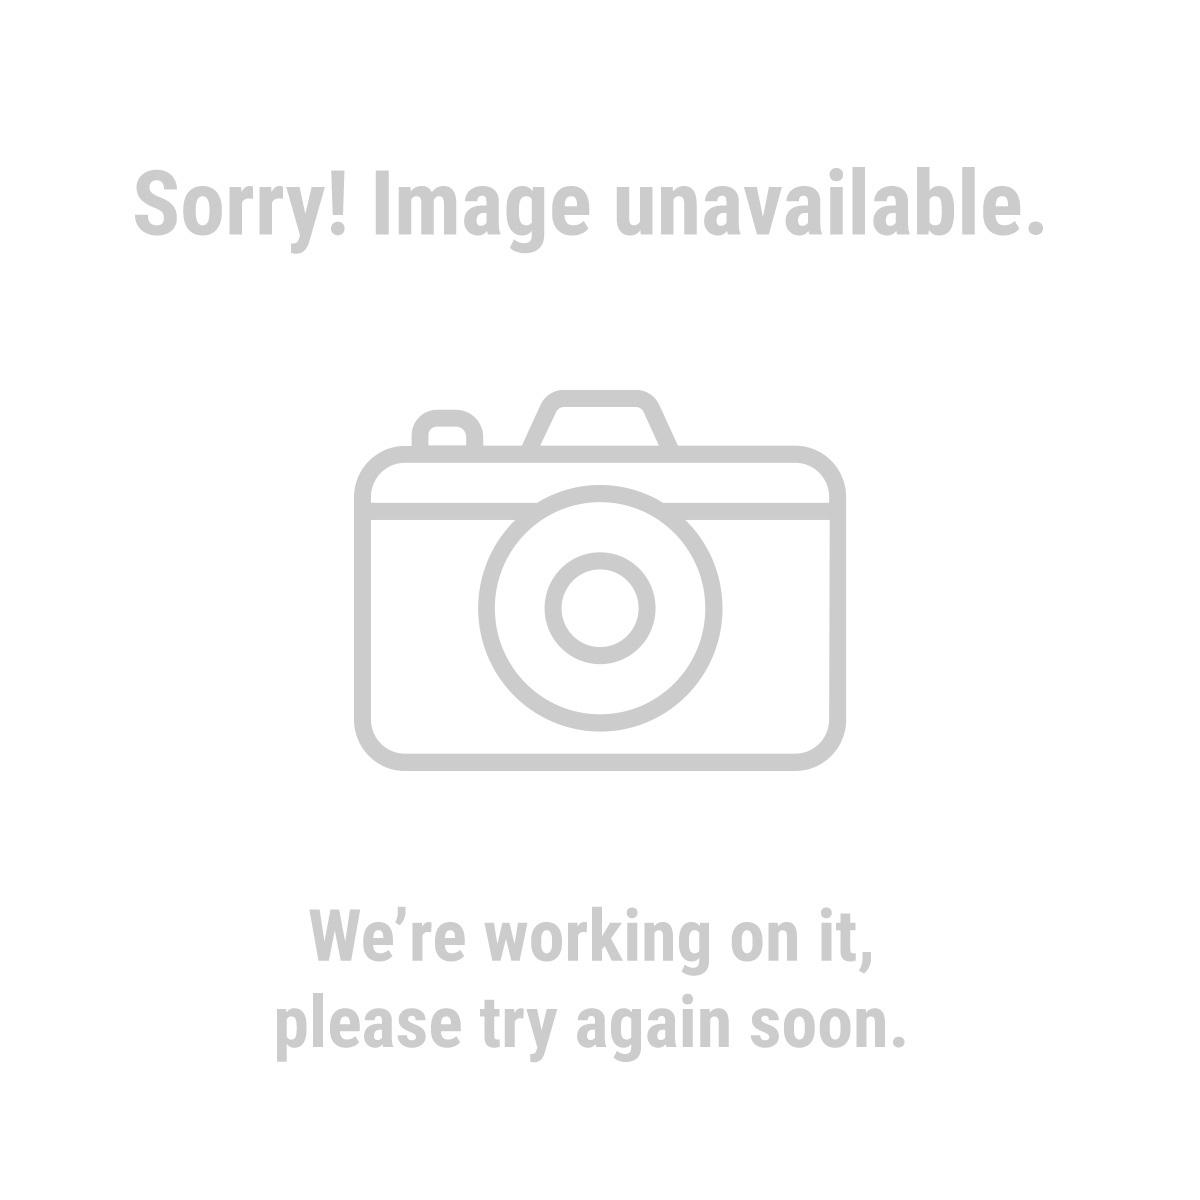 New condenser fan motor overheating for Harbor freight compressor motor